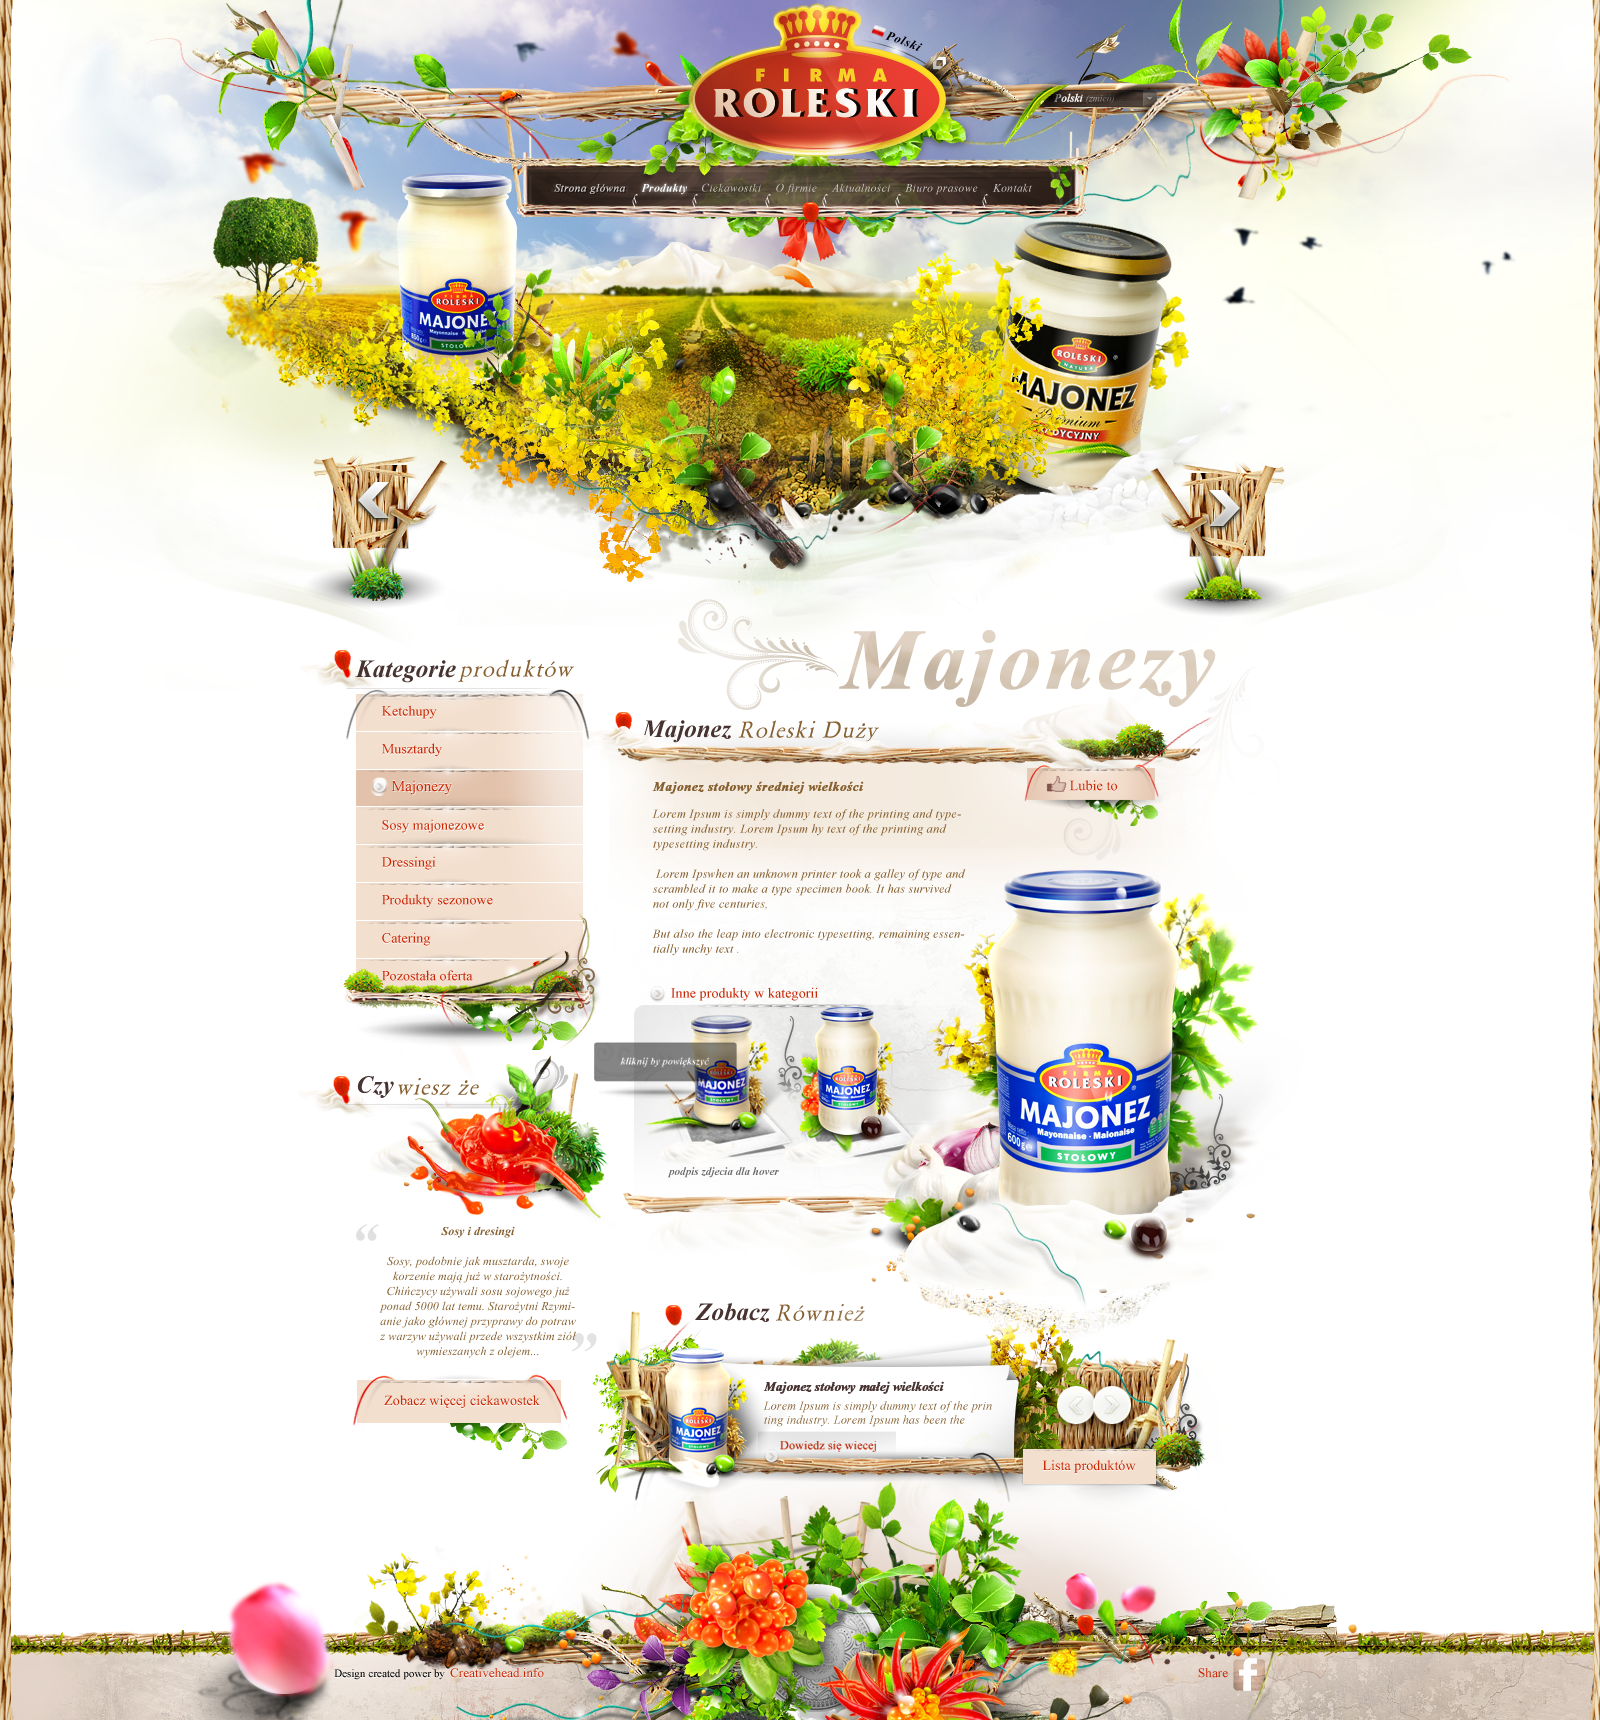 Roleski product page - mayonnaise by webdesigner1921